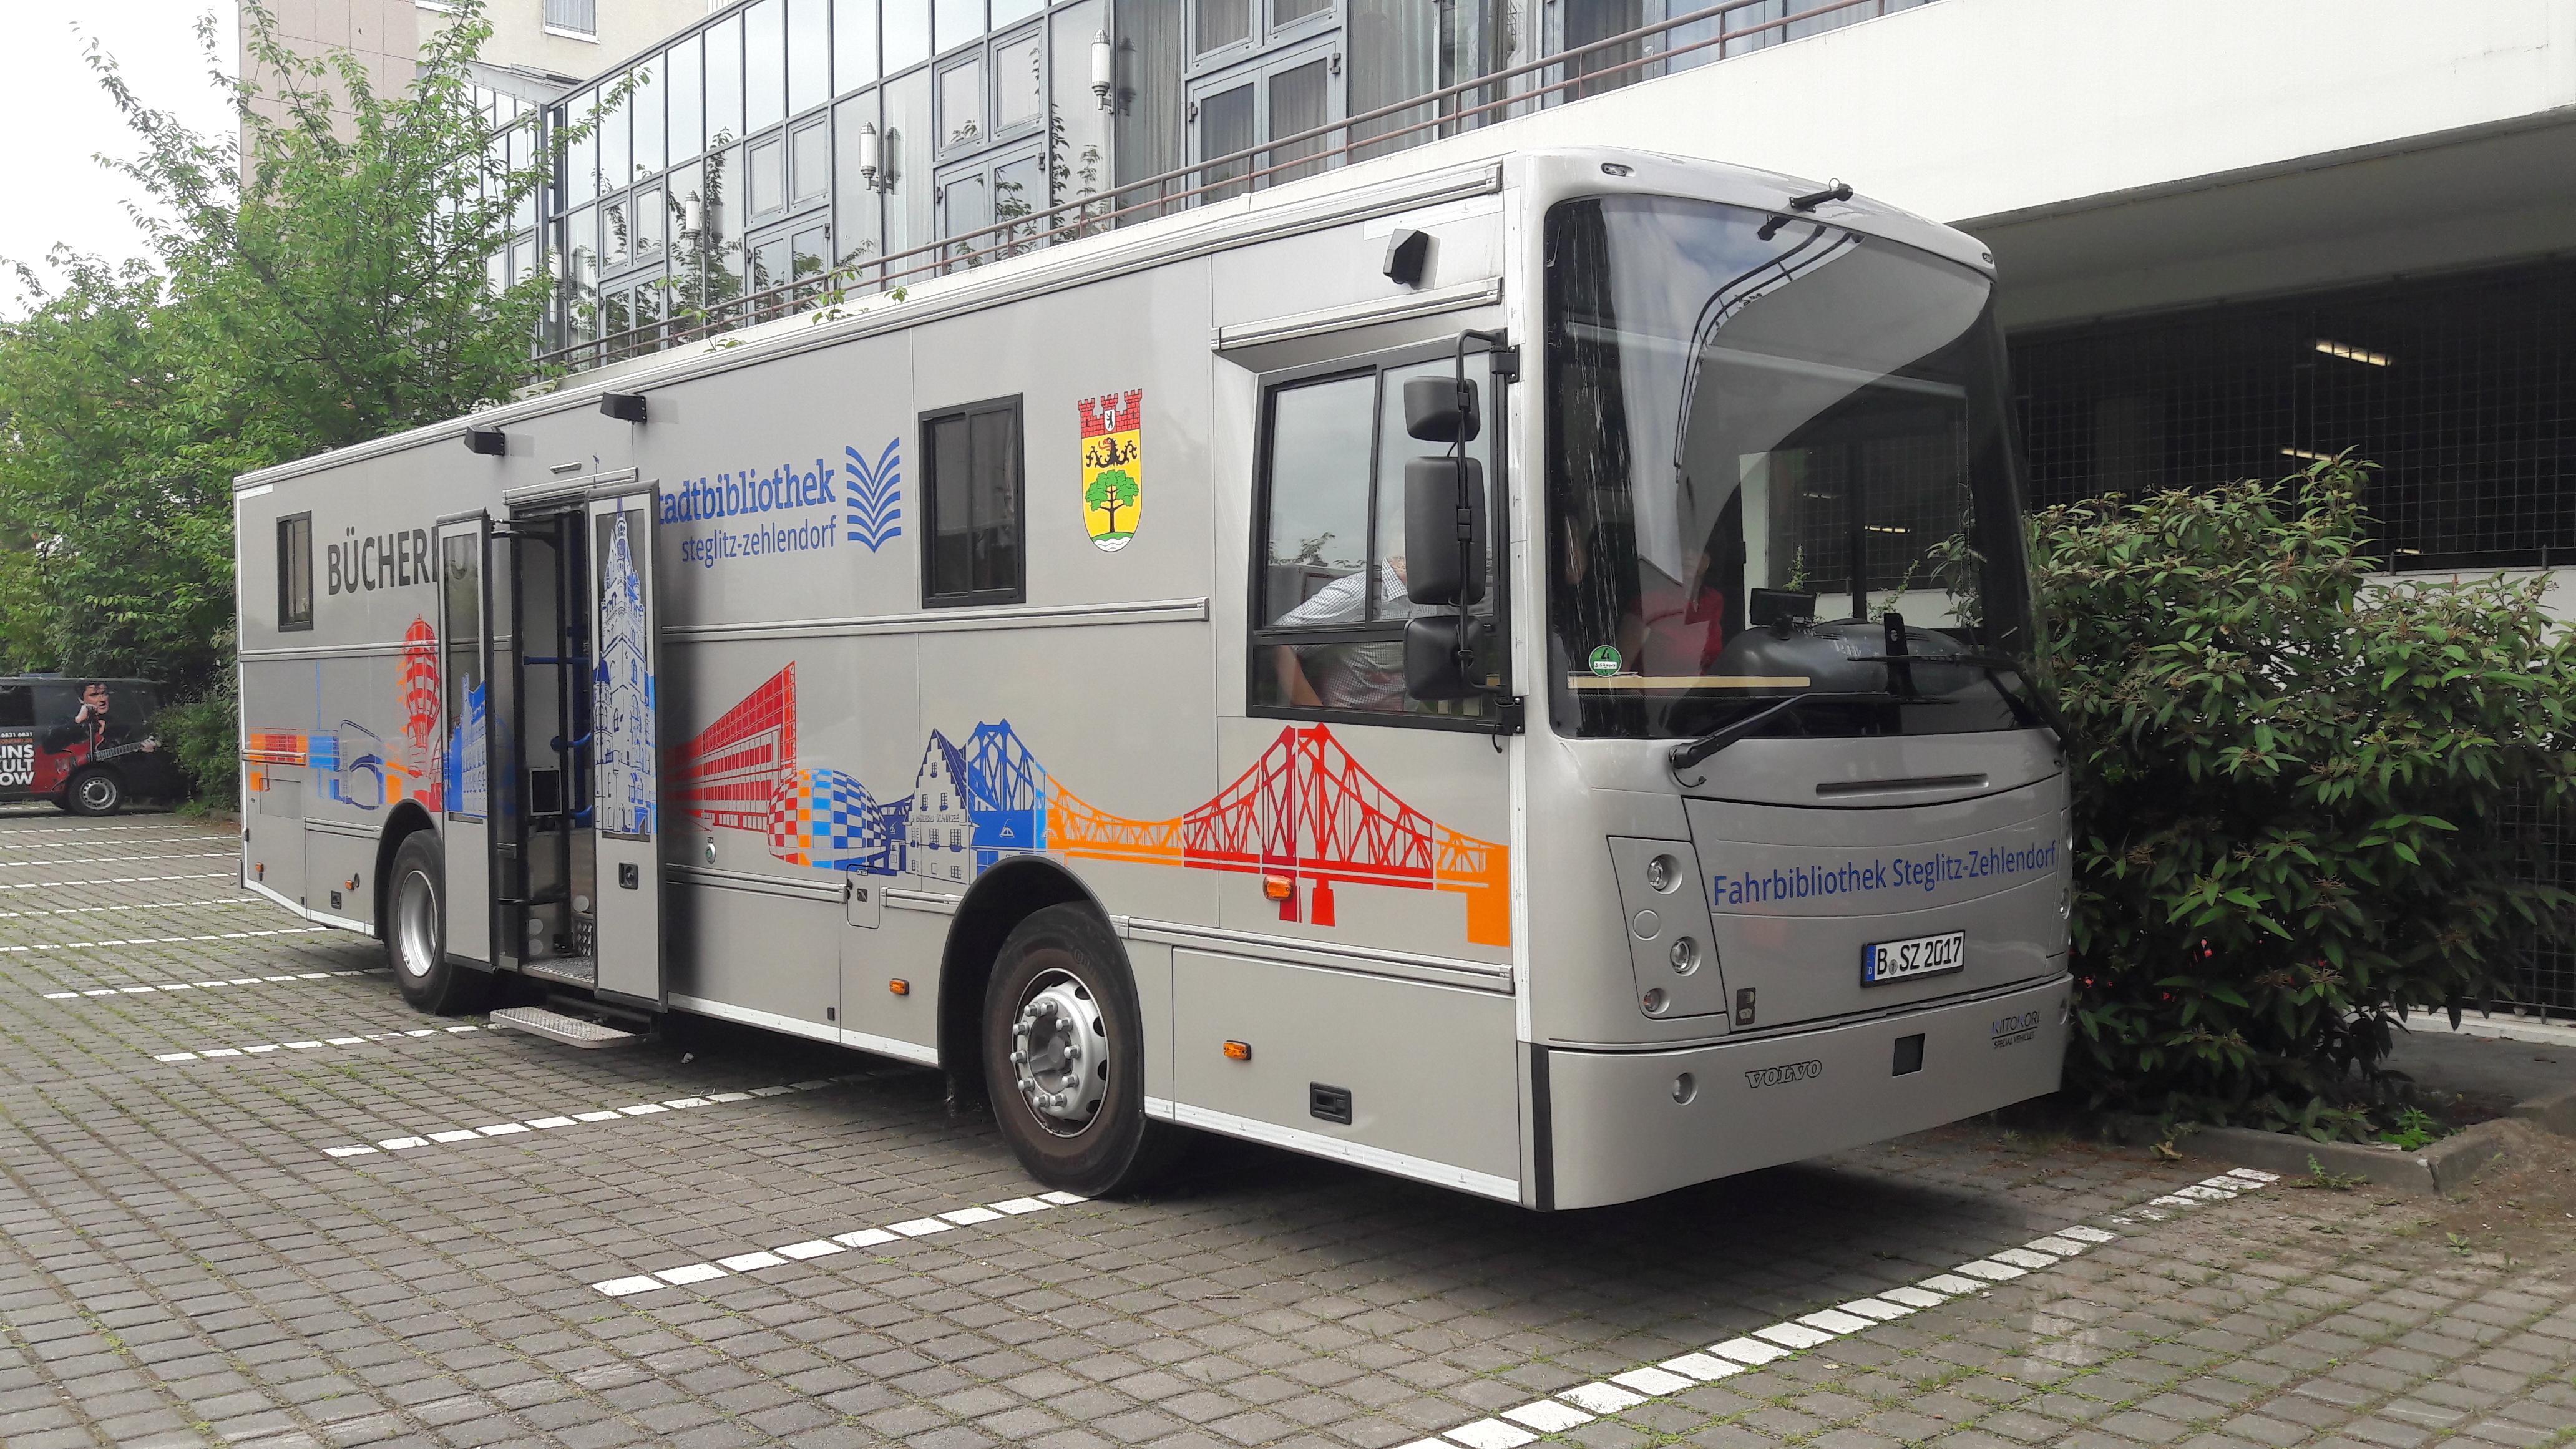 Fahrbibliothek Steglitz-Zehlendorf